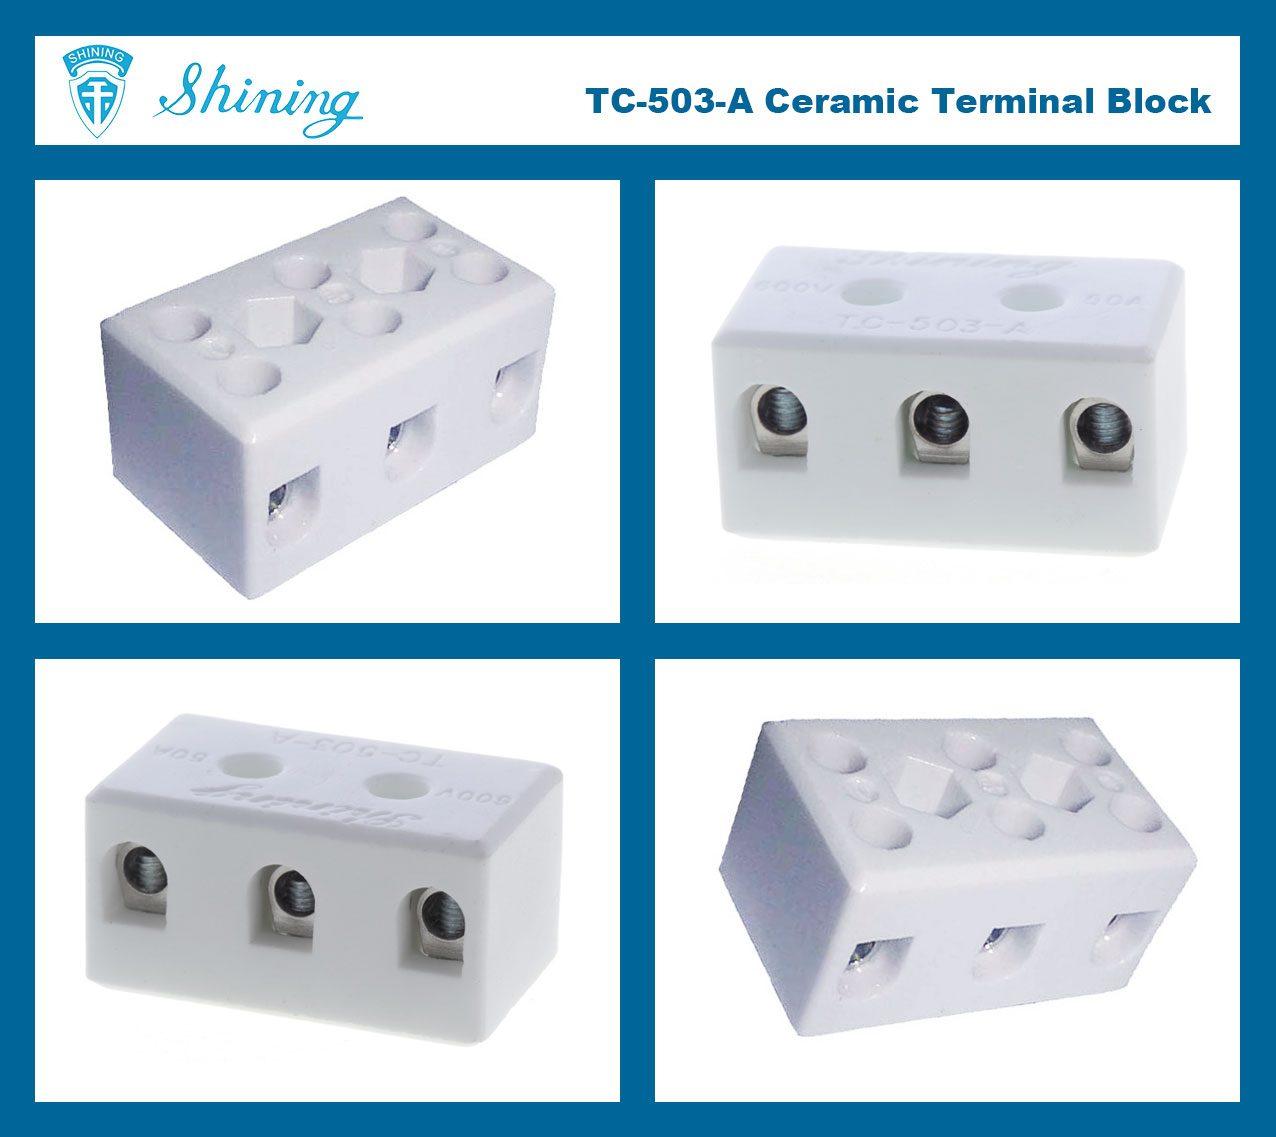 TC-503-A Panel Mounted 600V 50A 3 Pole Ceramic Terminal Block